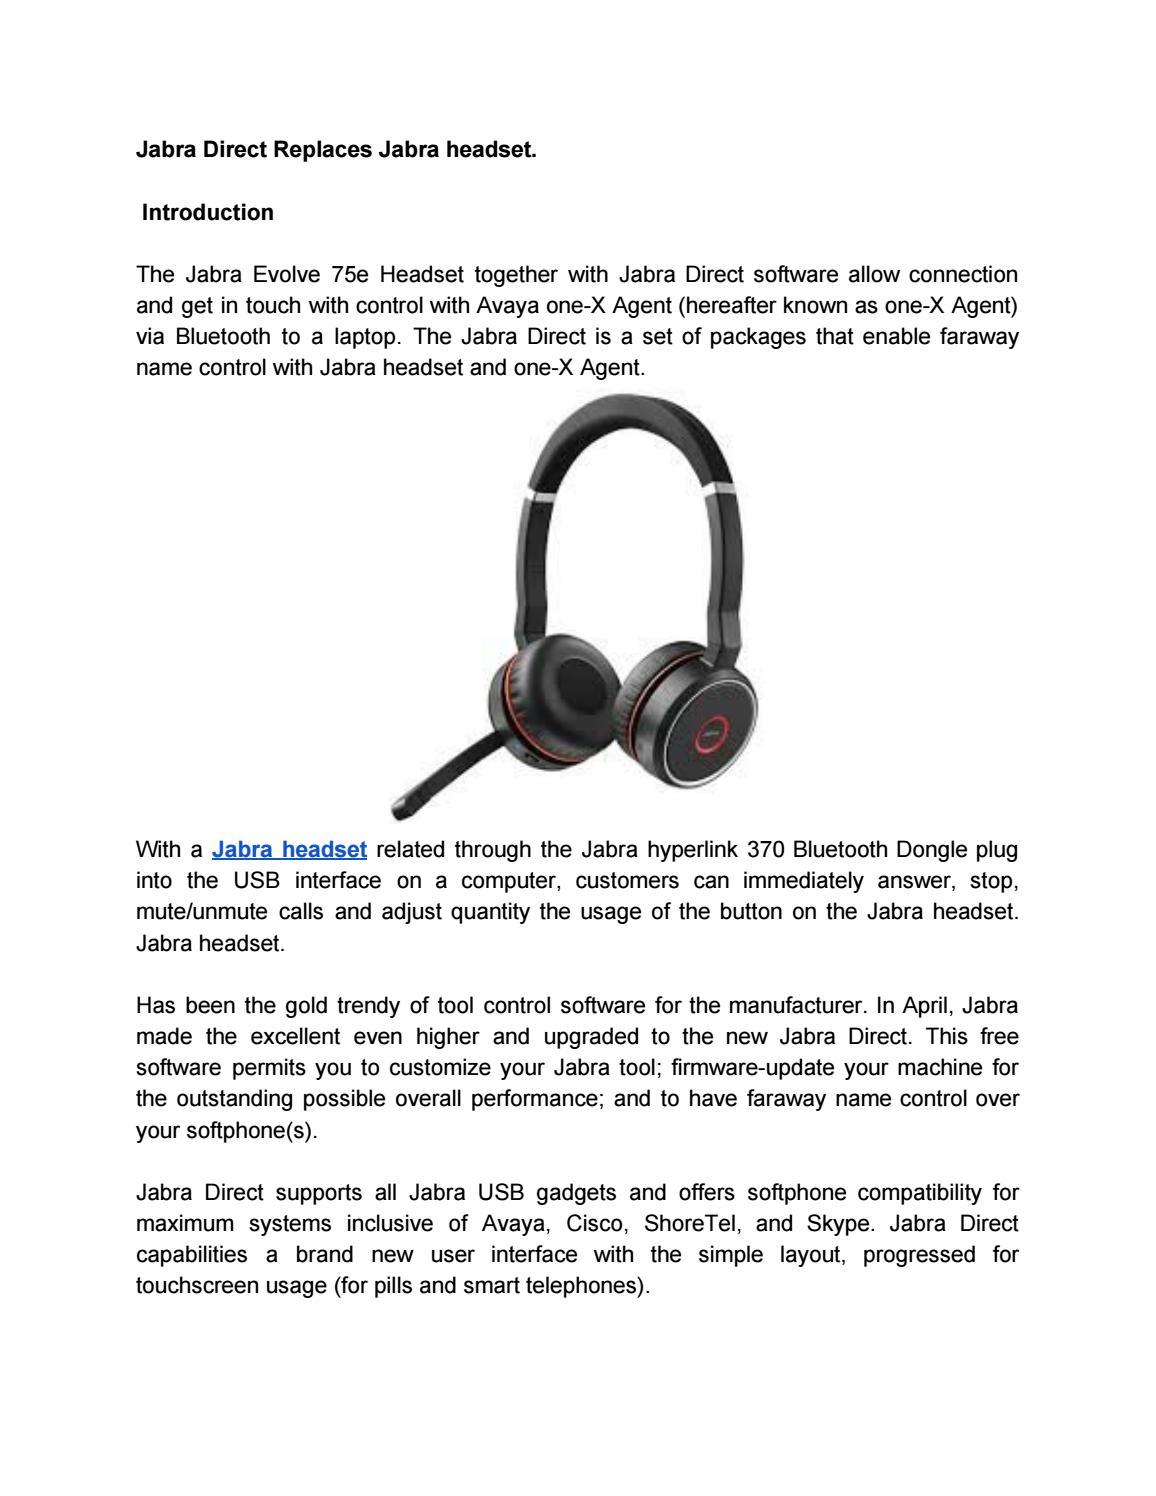 Jabra Direct Replaces Jabra headset  by maryjulie321 - issuu